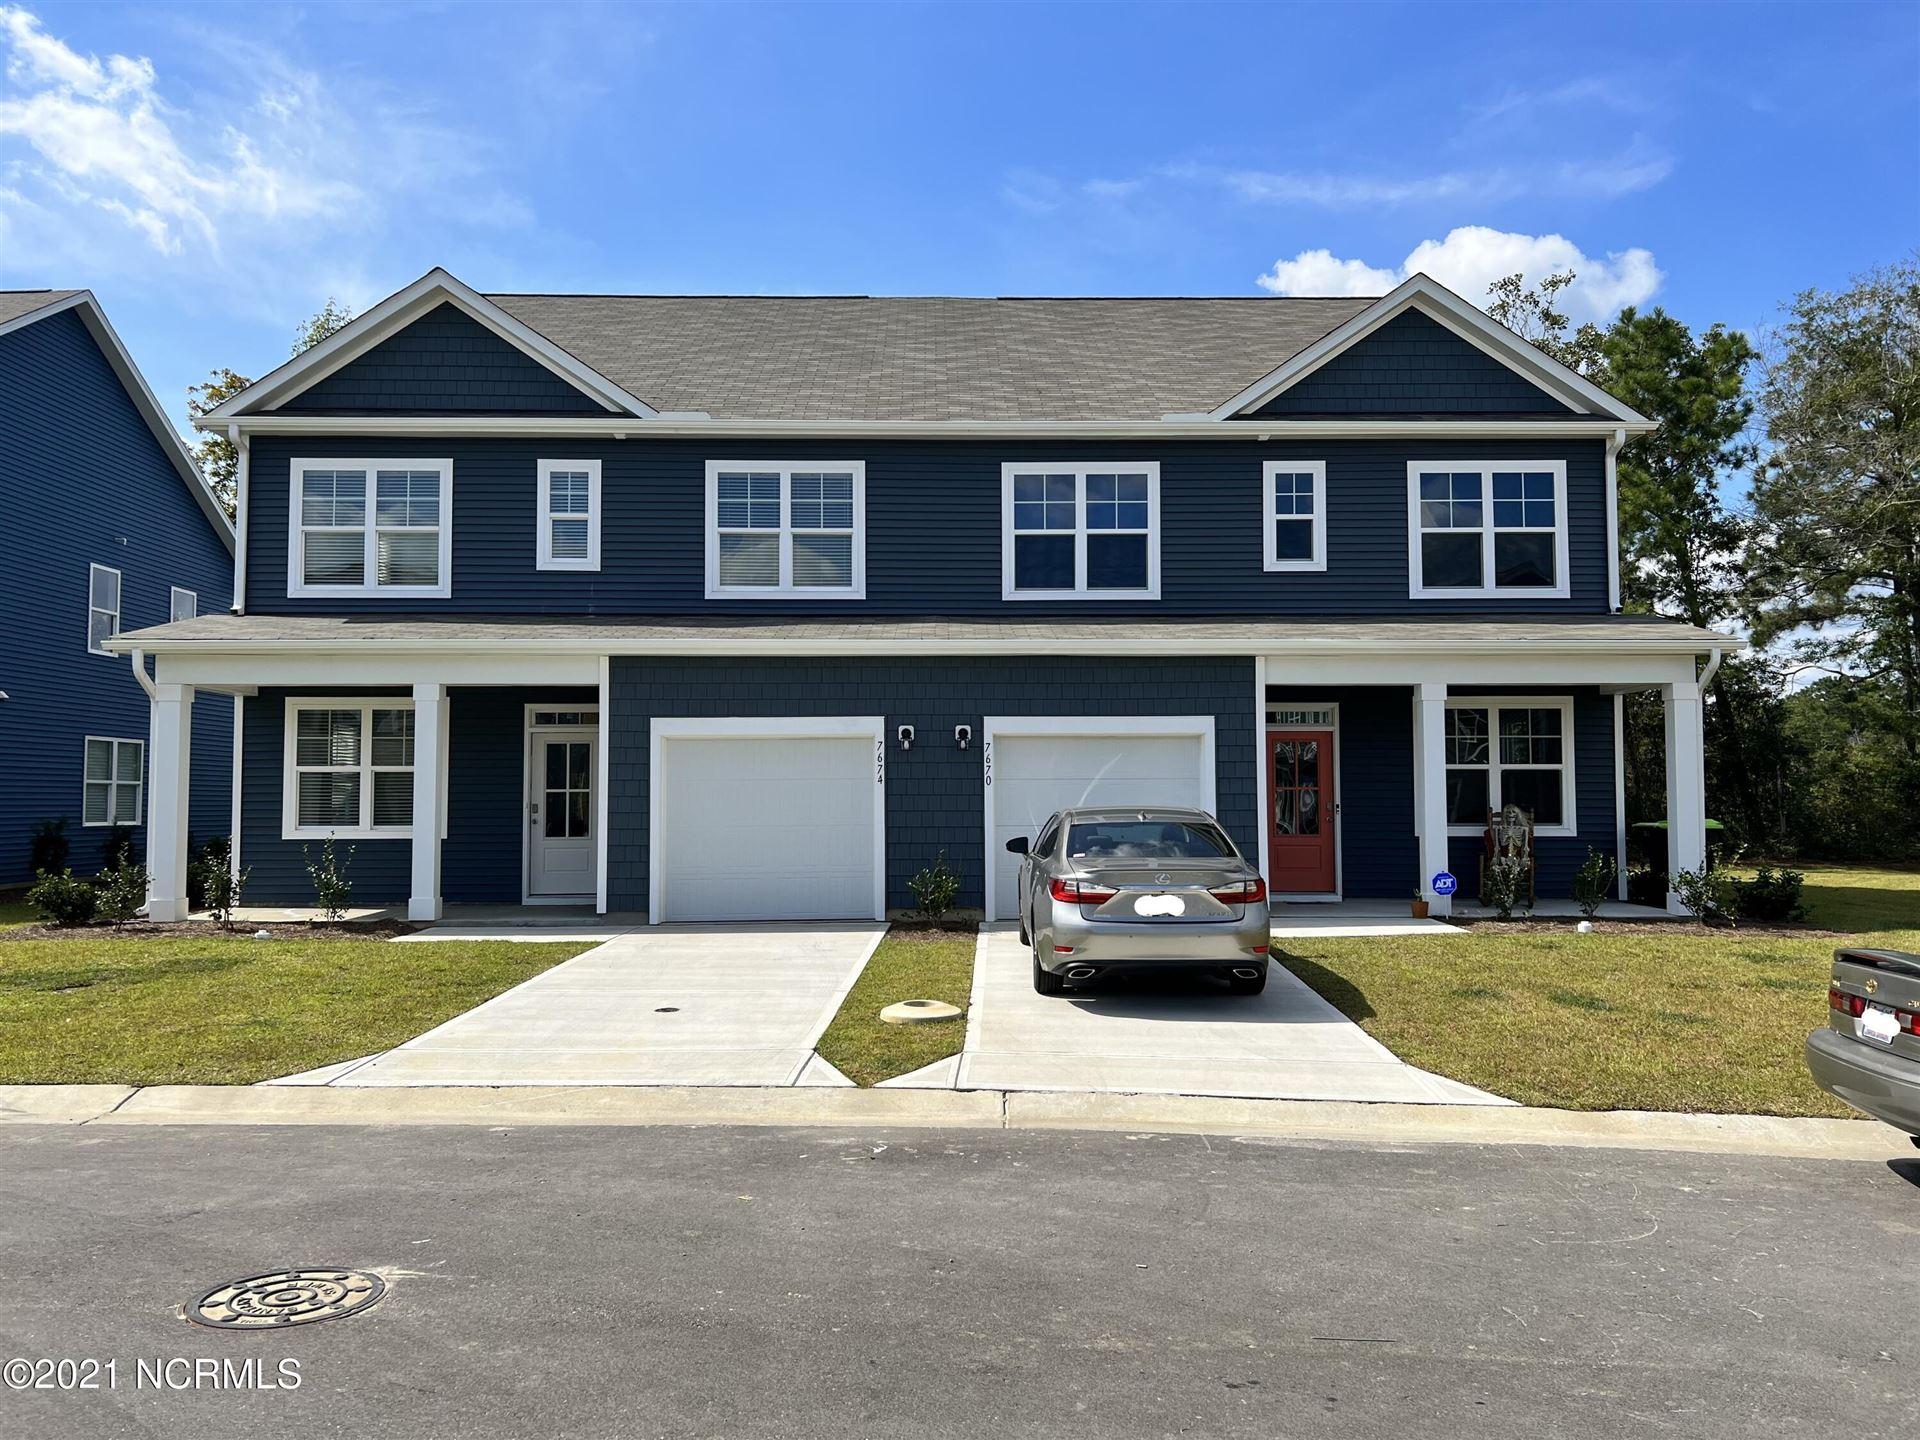 Photo of 4675 Wildaire Lane #Lot 60, Leland, NC 28451 (MLS # 100293289)